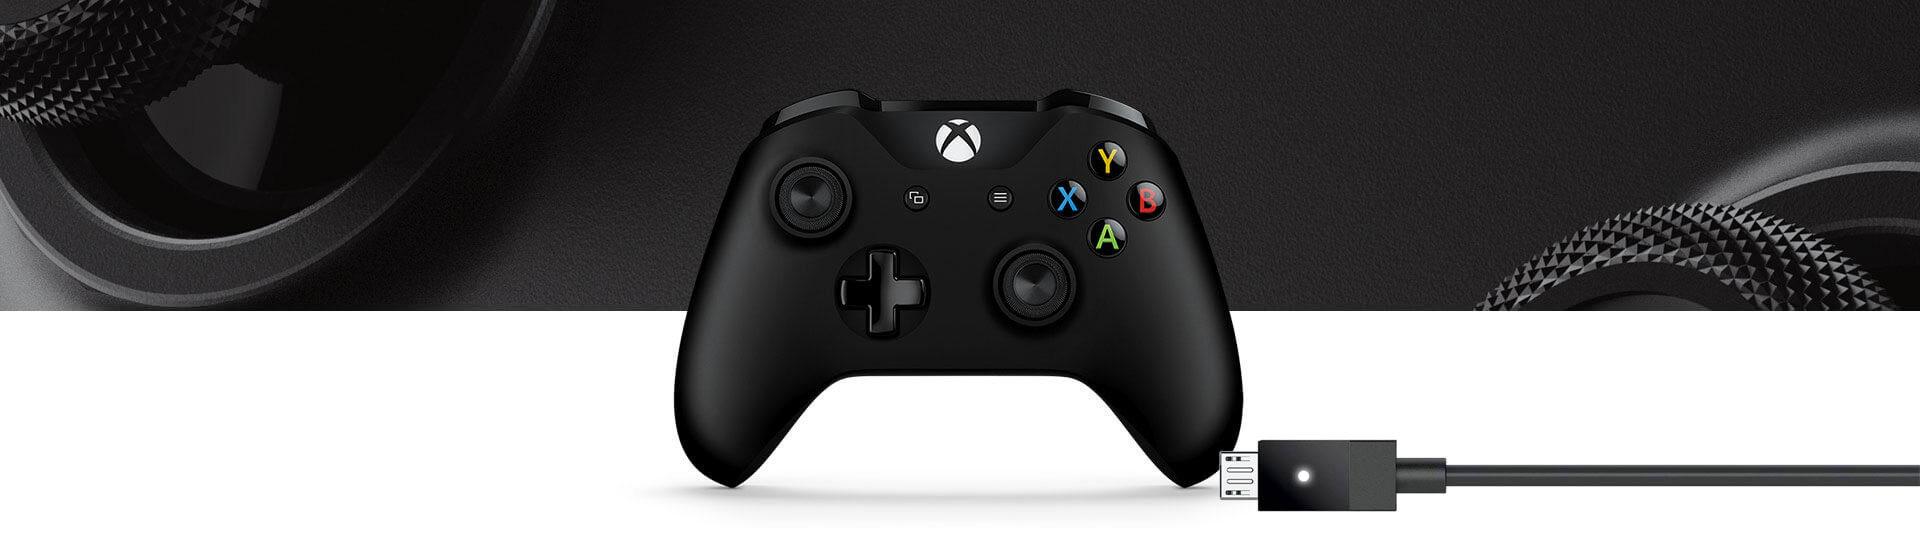 microsoft Xbox One S Wireless Controller with Cable for Windows 1 1 - دسته بازی Xbox One S به همراه کابل مخصوص Windows